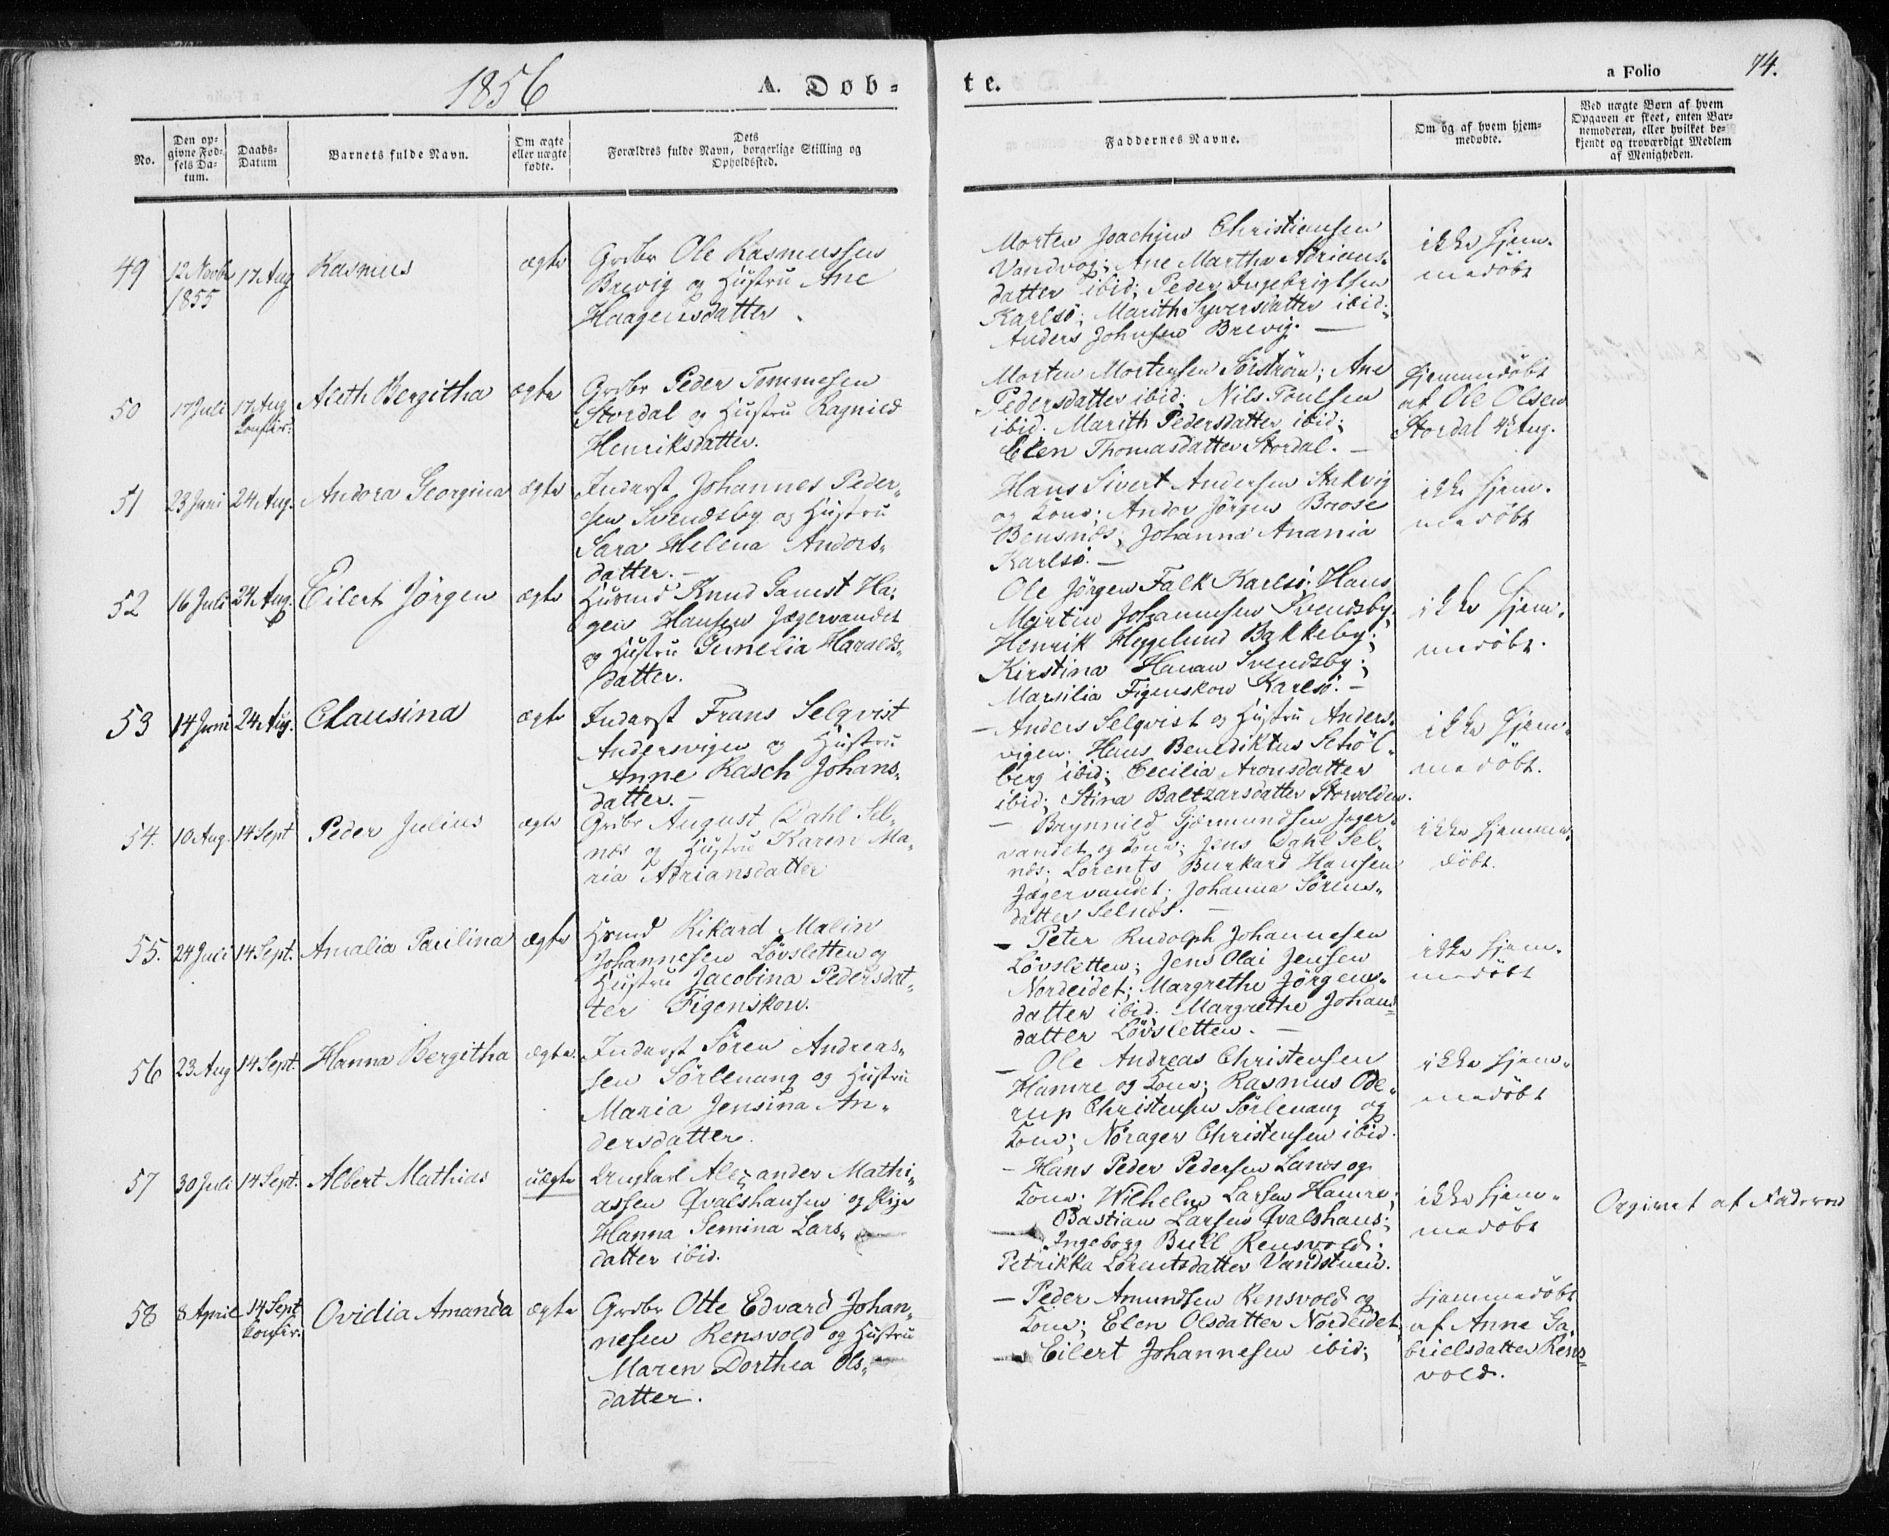 SATØ, Karlsøy sokneprestembete, H/Ha/Haa/L0003kirke: Ministerialbok nr. 3, 1843-1860, s. 74